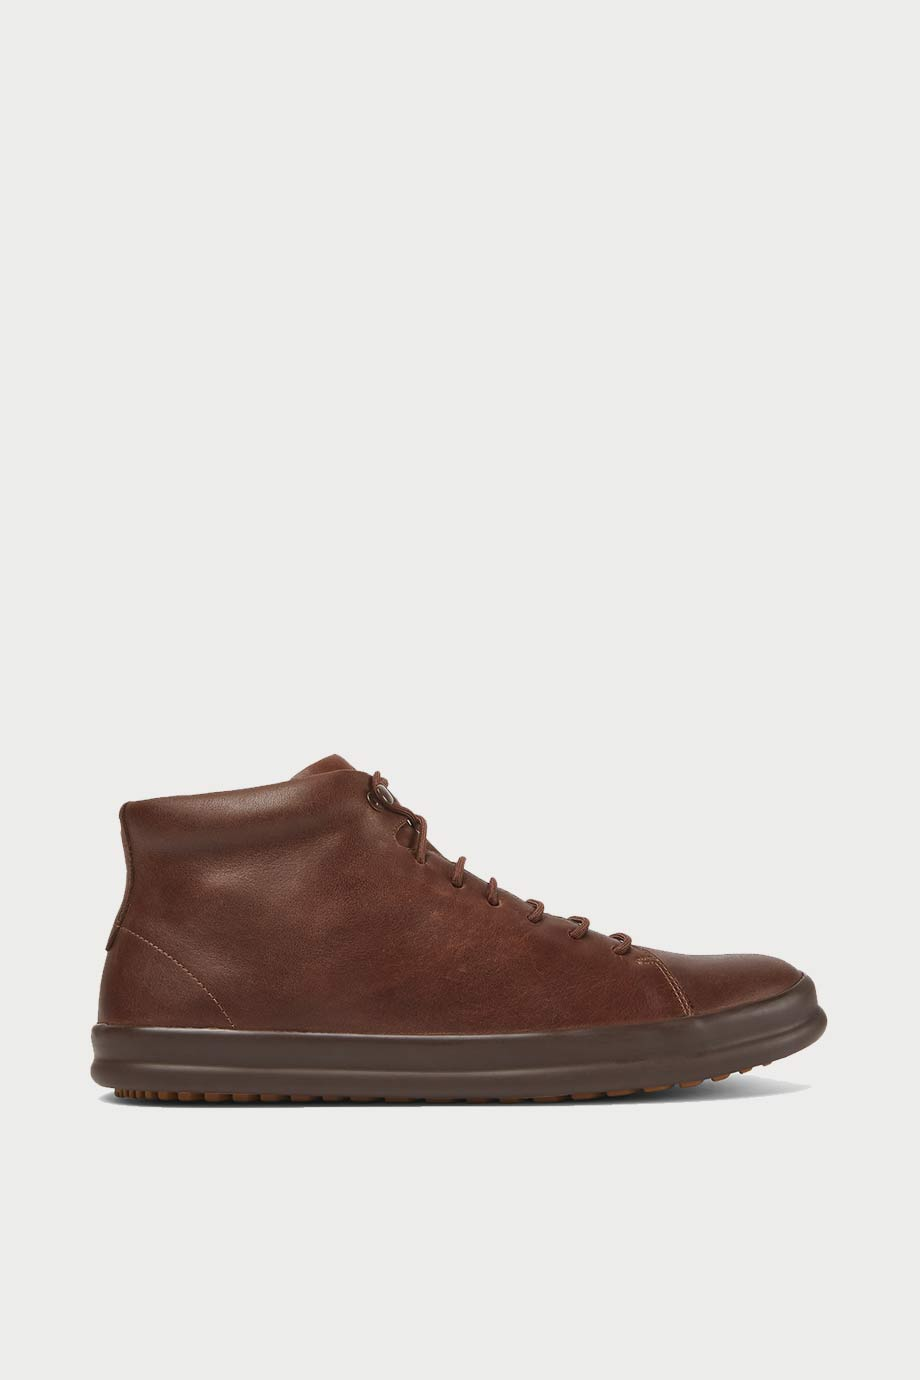 spiridoula metheniti shoes xalkida p K300236 012 camper